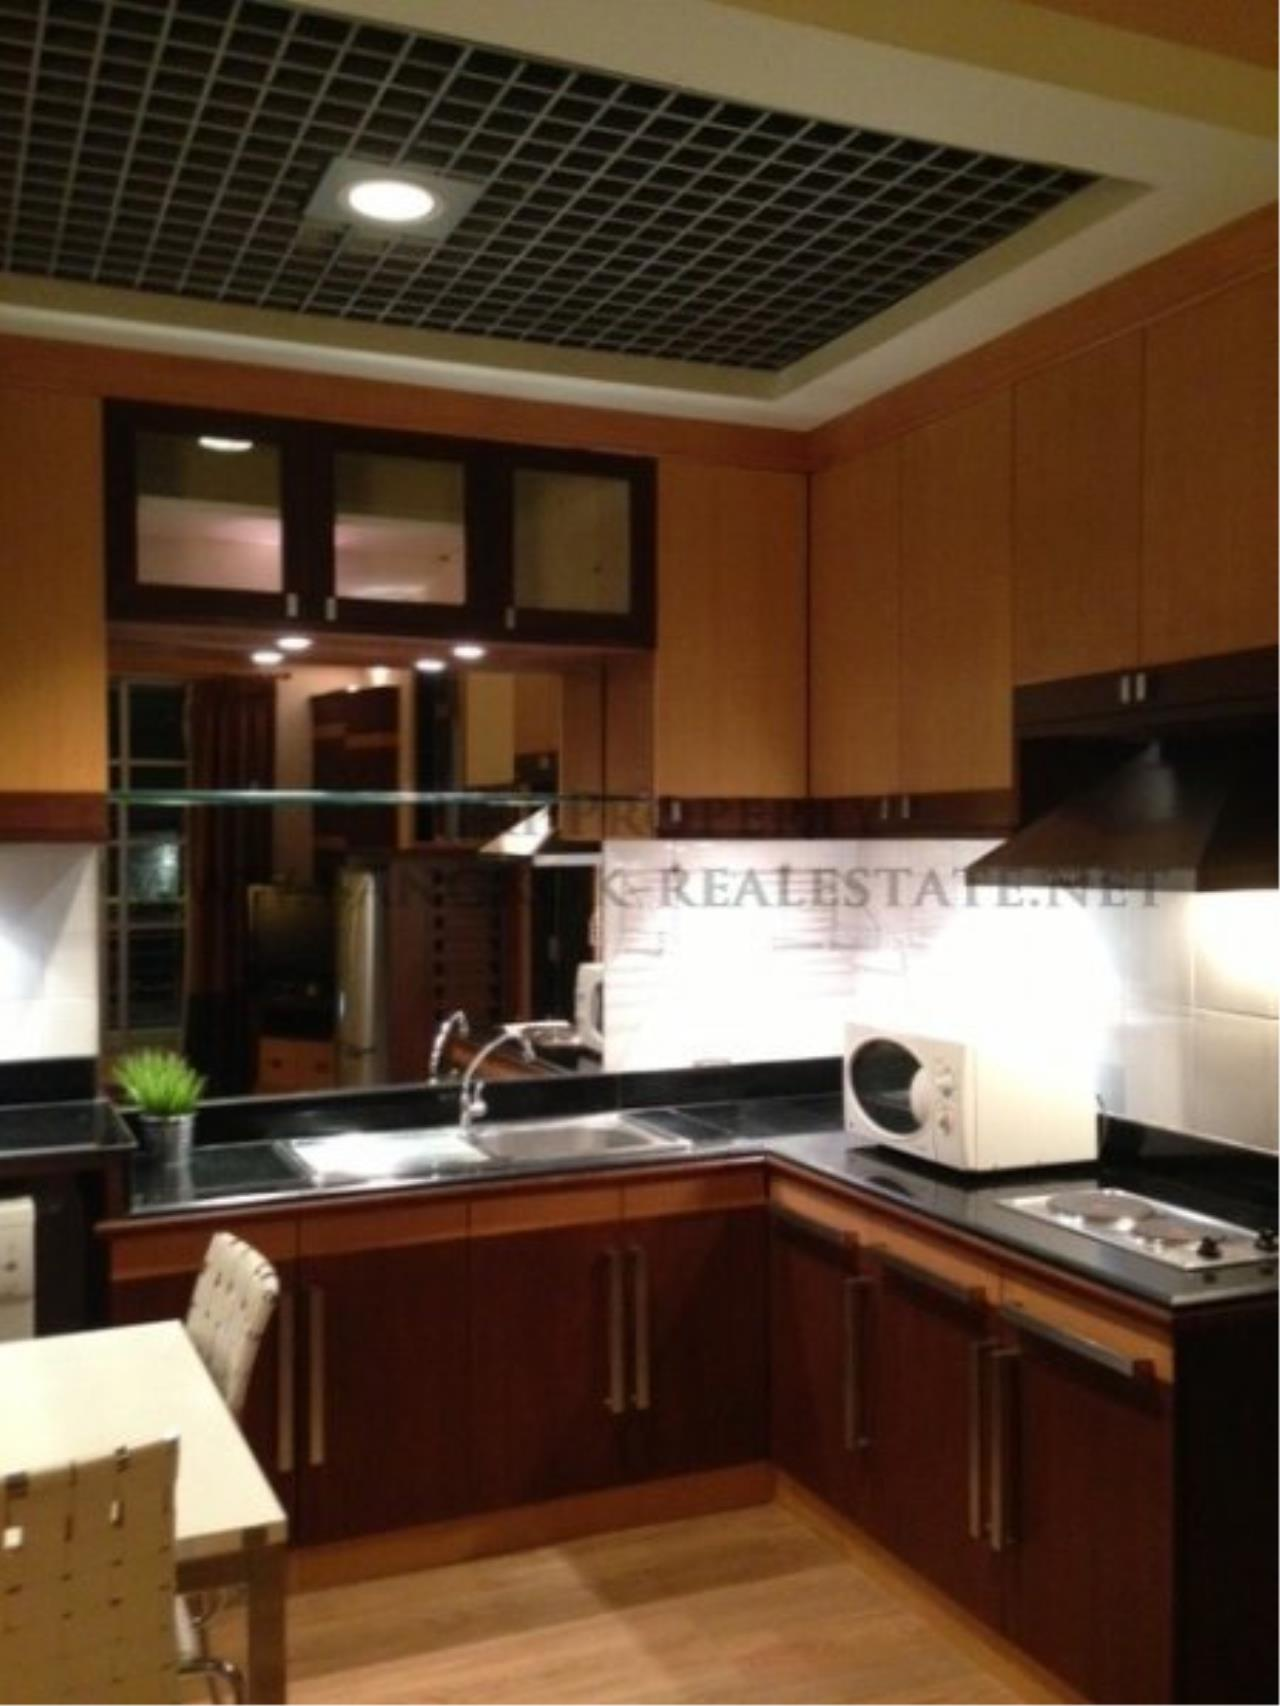 Piri Property Agency's Nice 1 Bedroom Condo near Ratchtewi BTS Station - 58 SQM - 30K 2